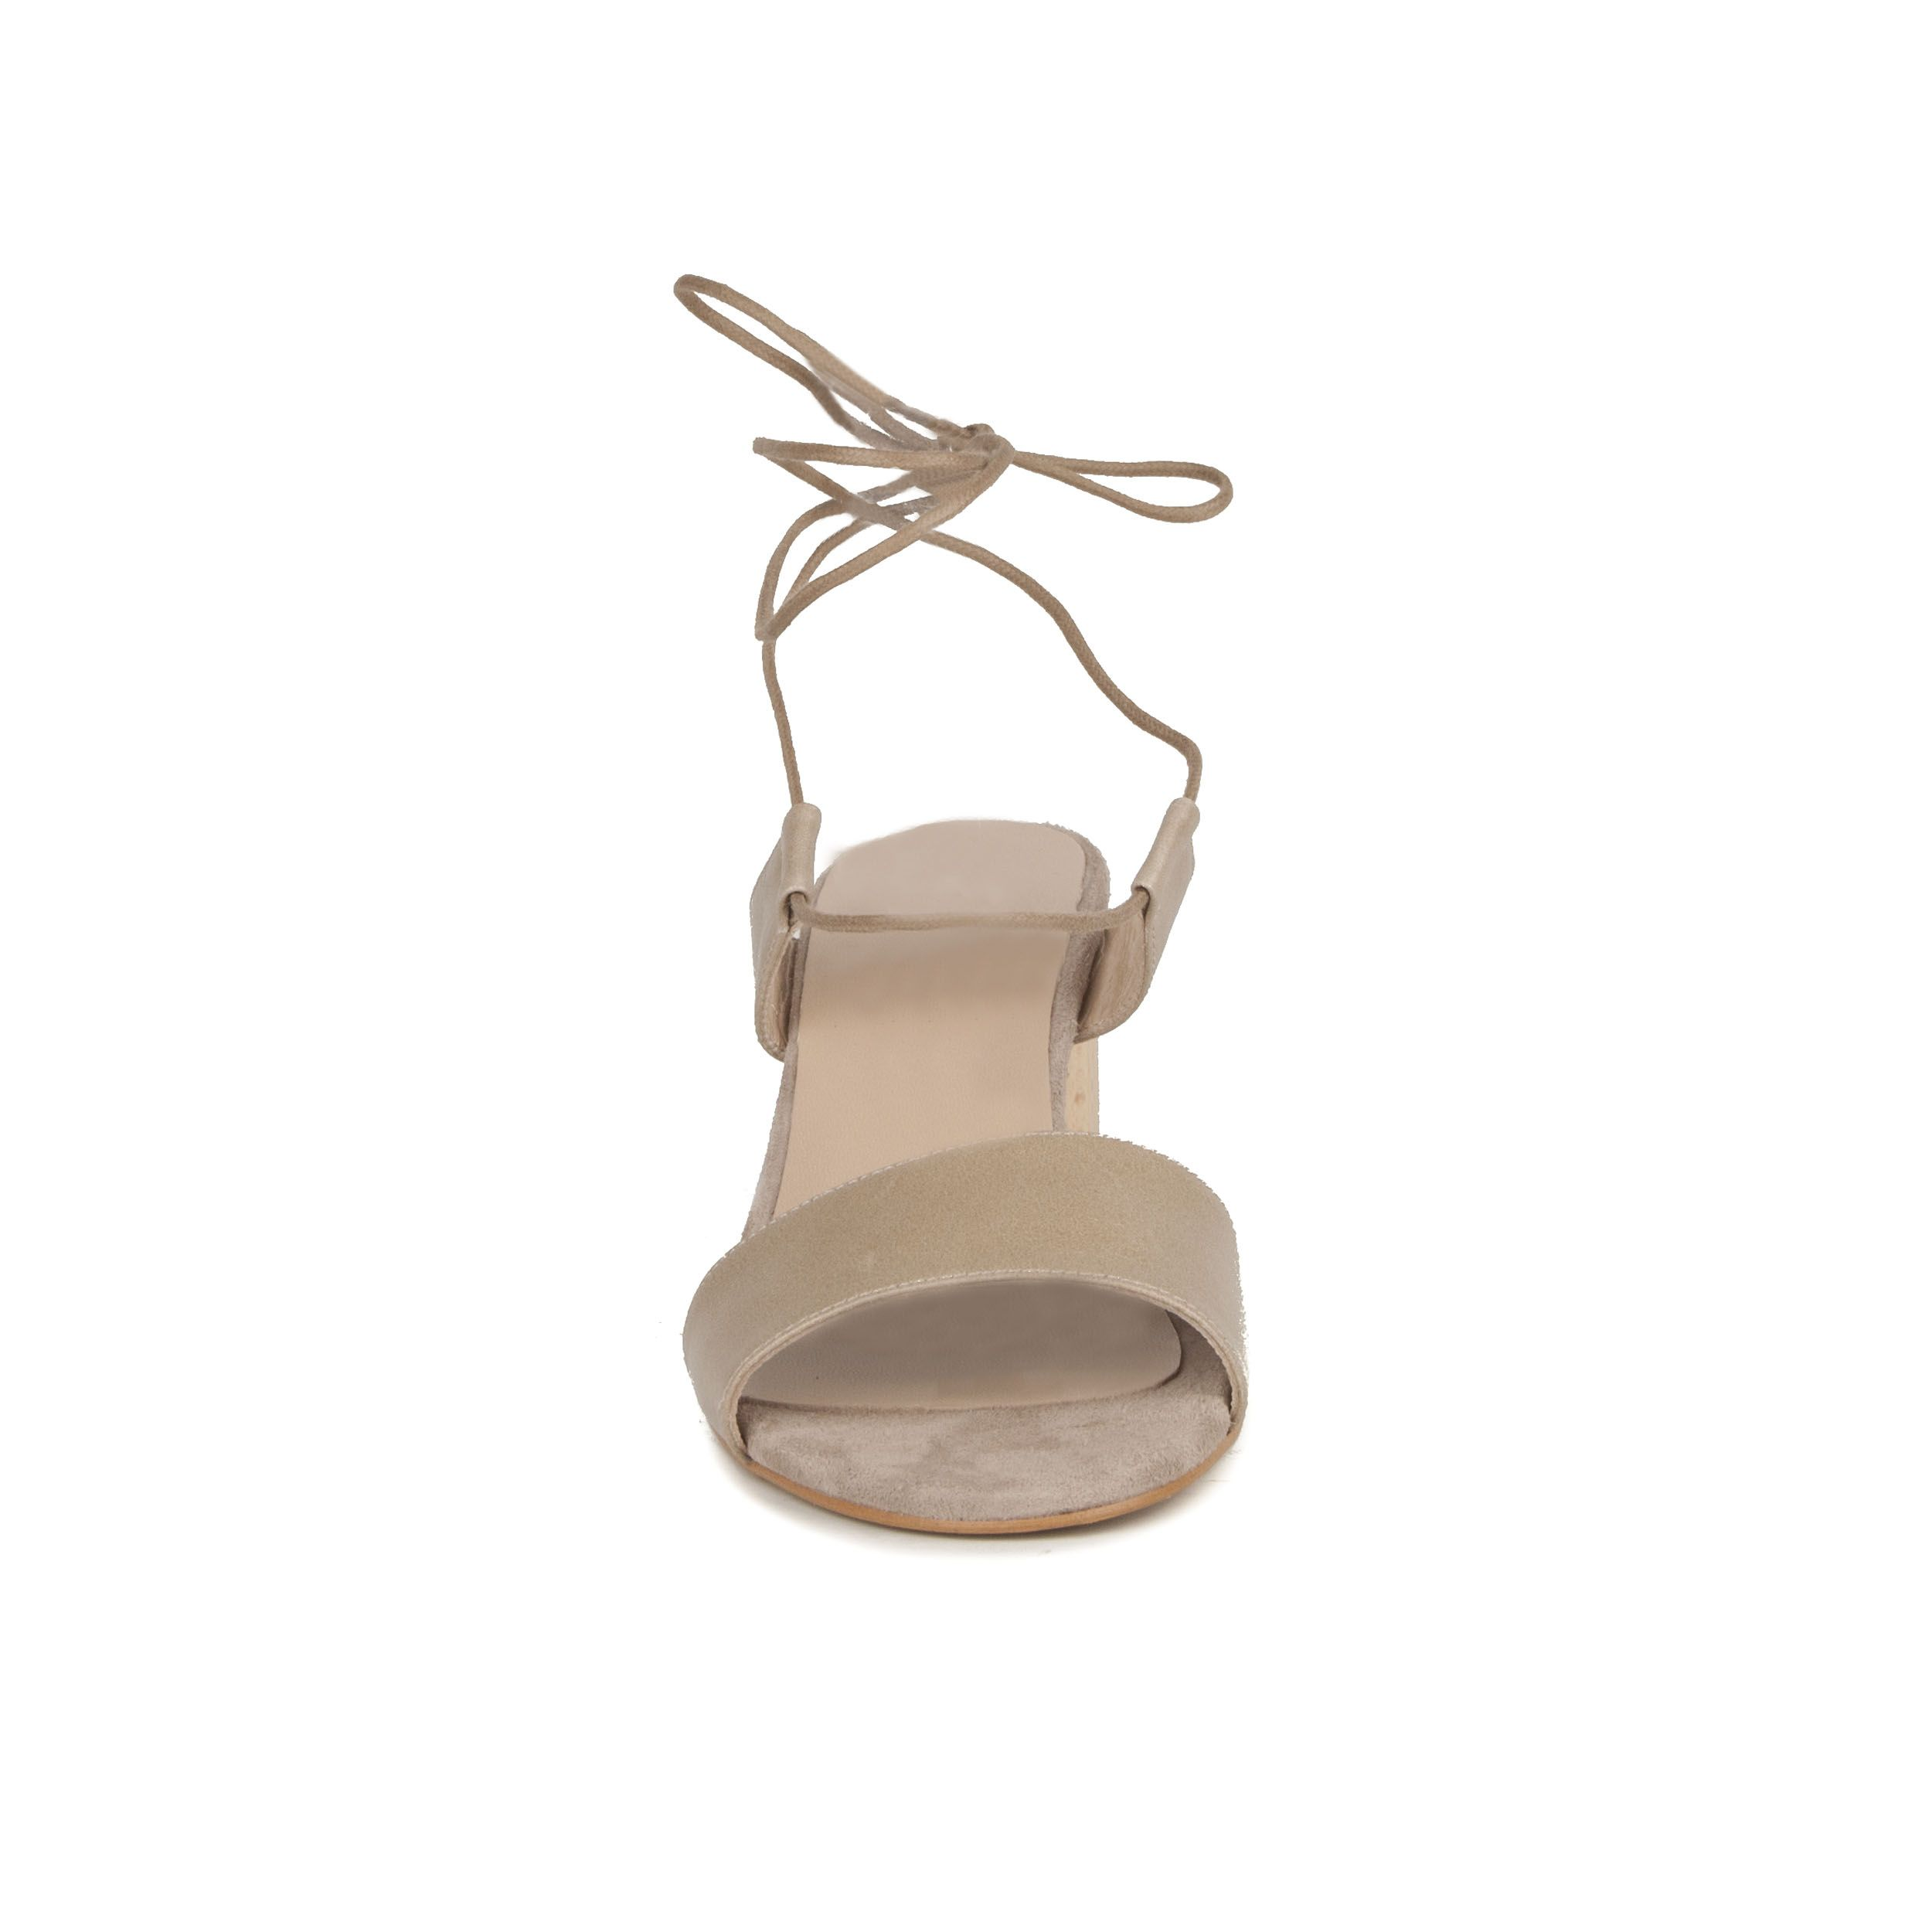 Montevita Block Heel Sandal in Taupe